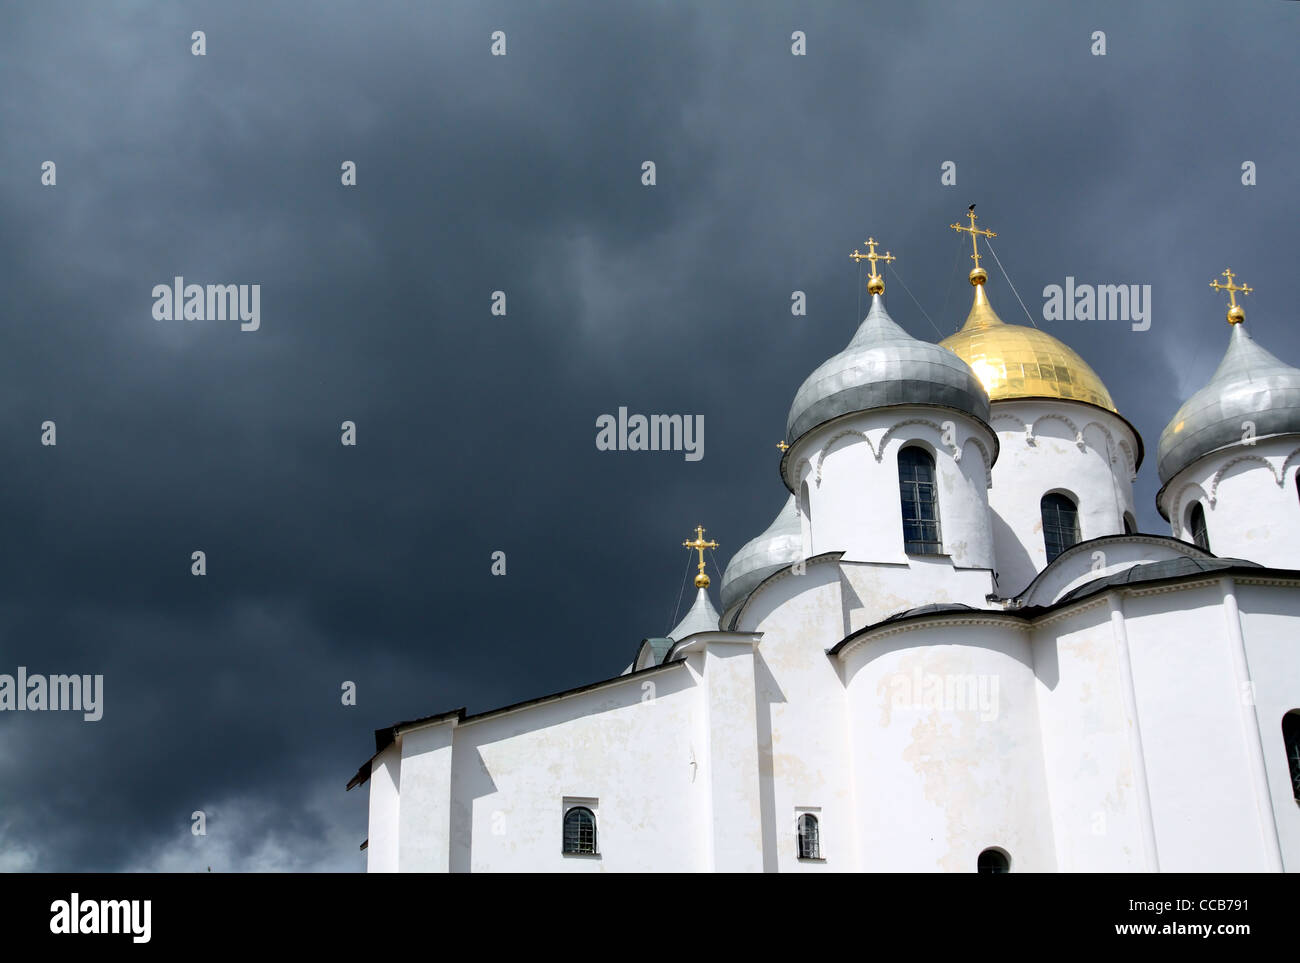 Iglesia ortodoxa cristiana sobre el fondo nublado Foto de stock